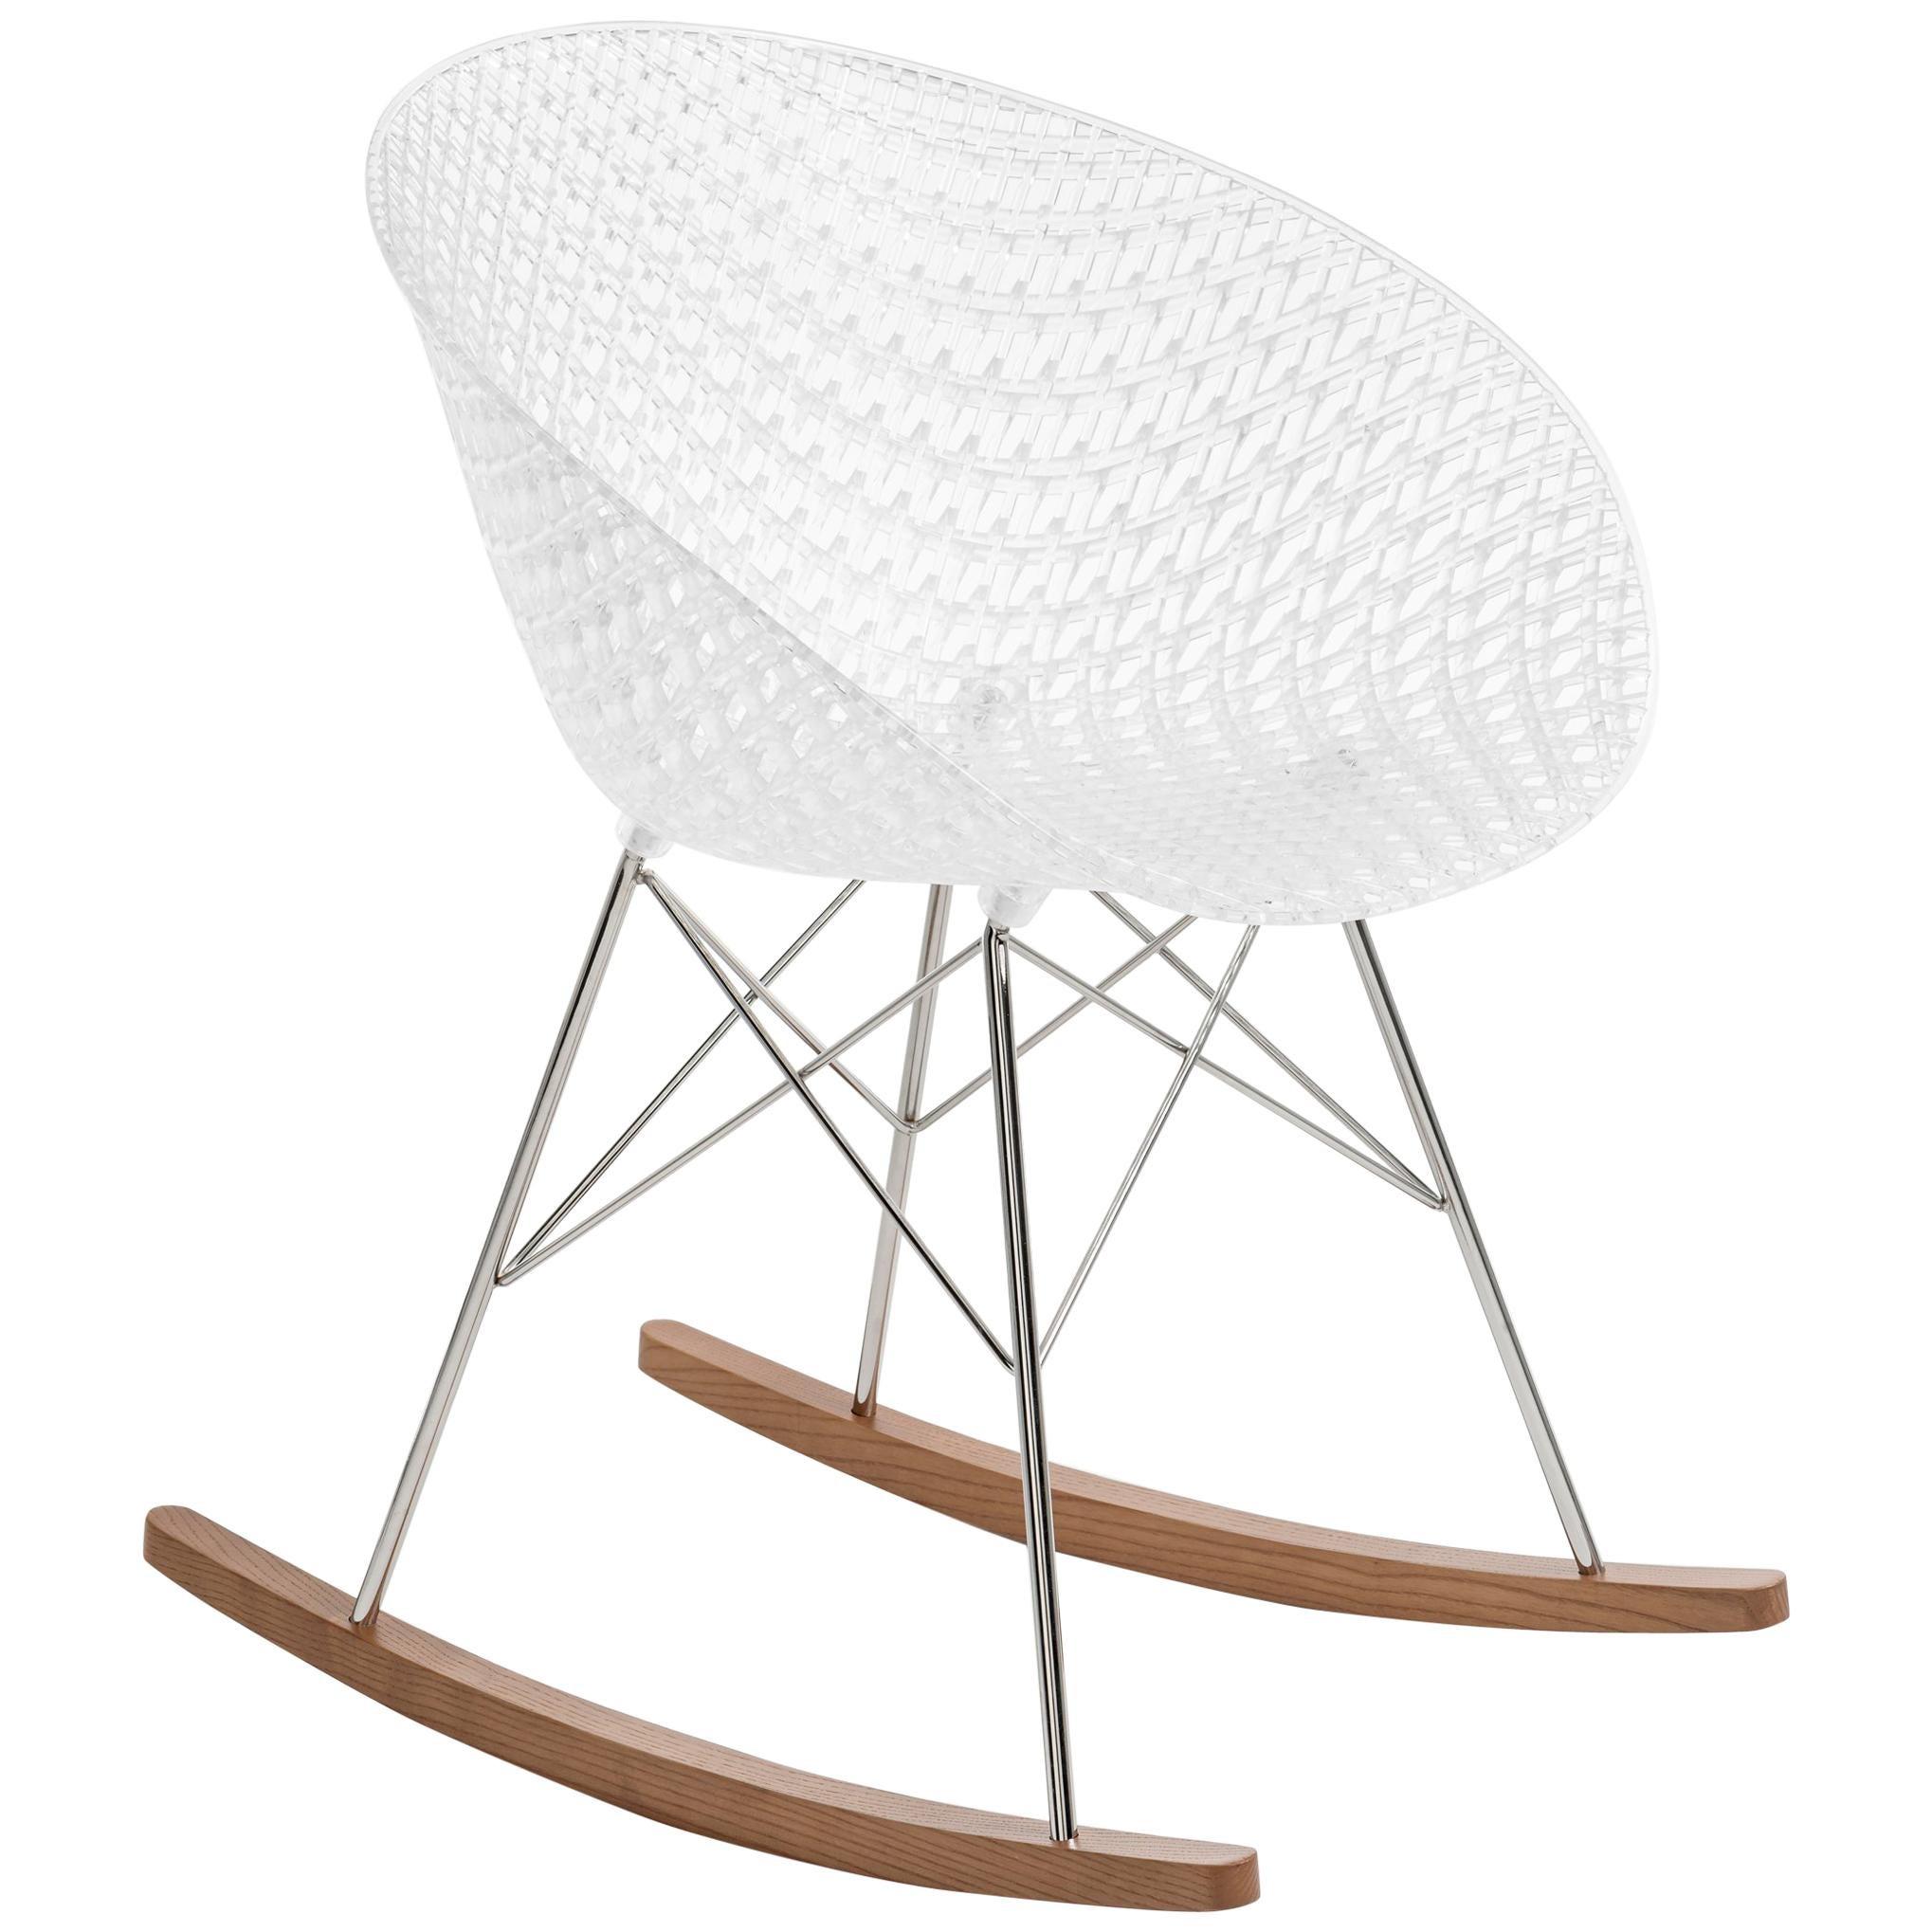 Kartell Smatrik Rocking Chair in White with Chrome Legs by Tokujin Yoshioka